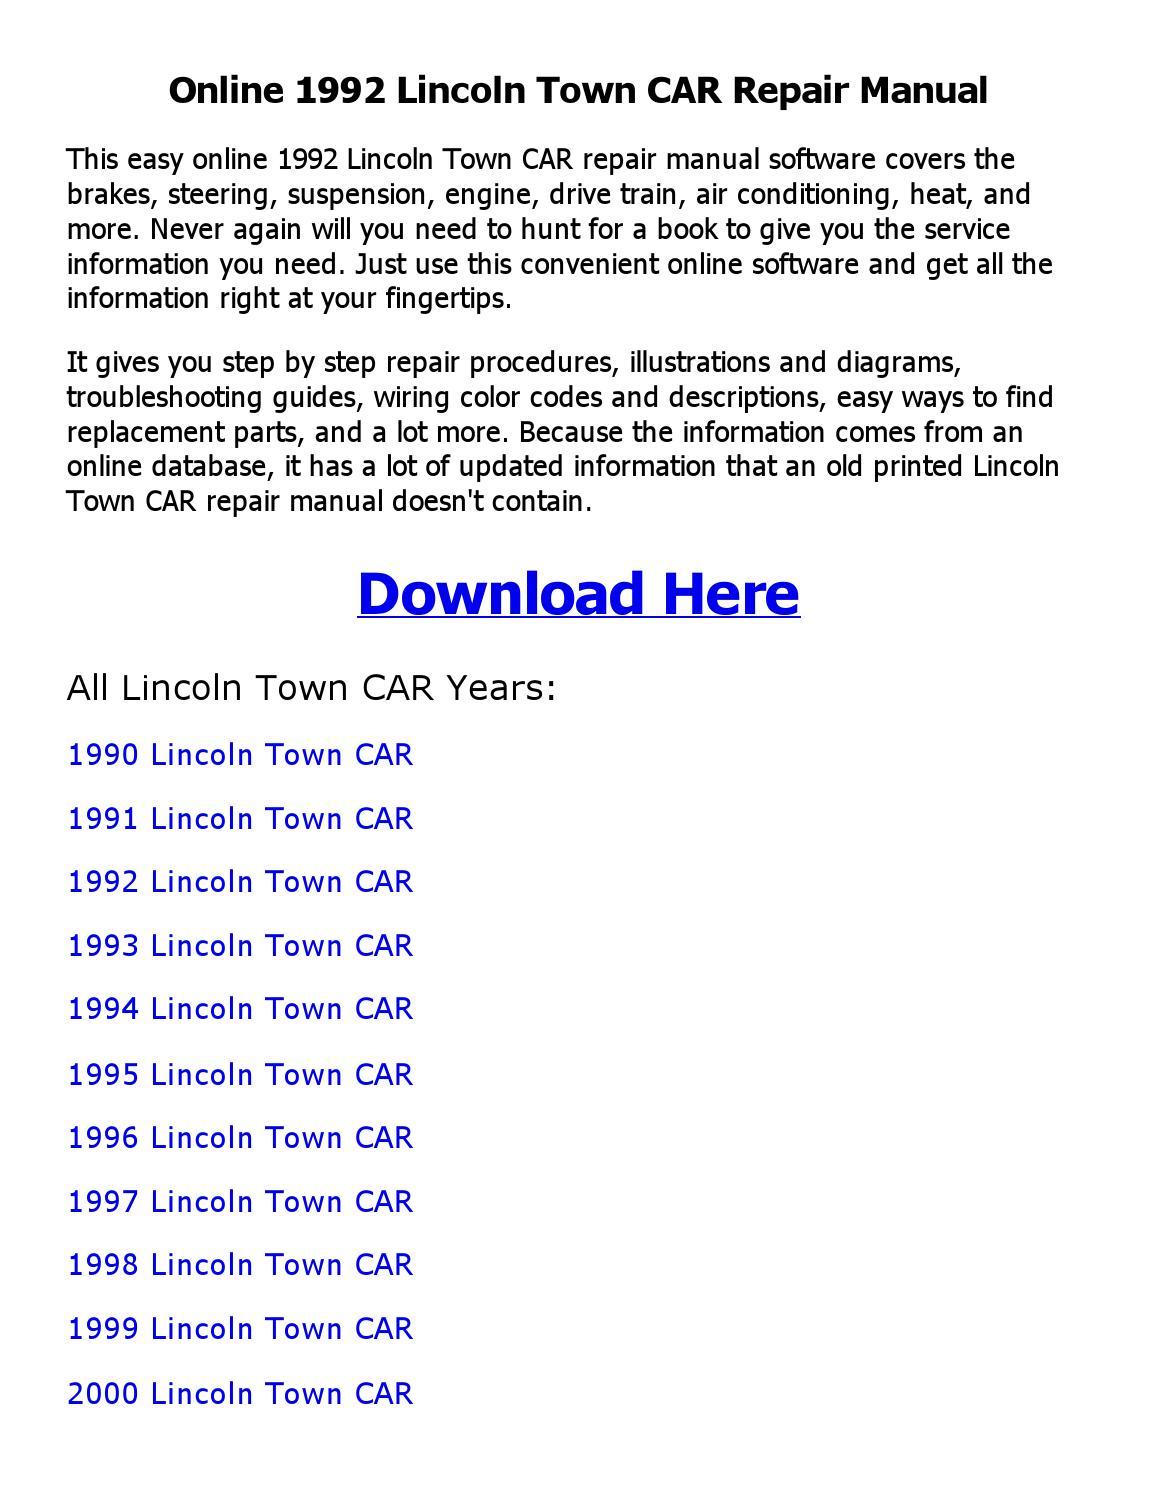 1990 lincoln town car engine diagram 1992 lincoln town car repair manual online by jonesalbert012 issuu  1992 lincoln town car repair manual